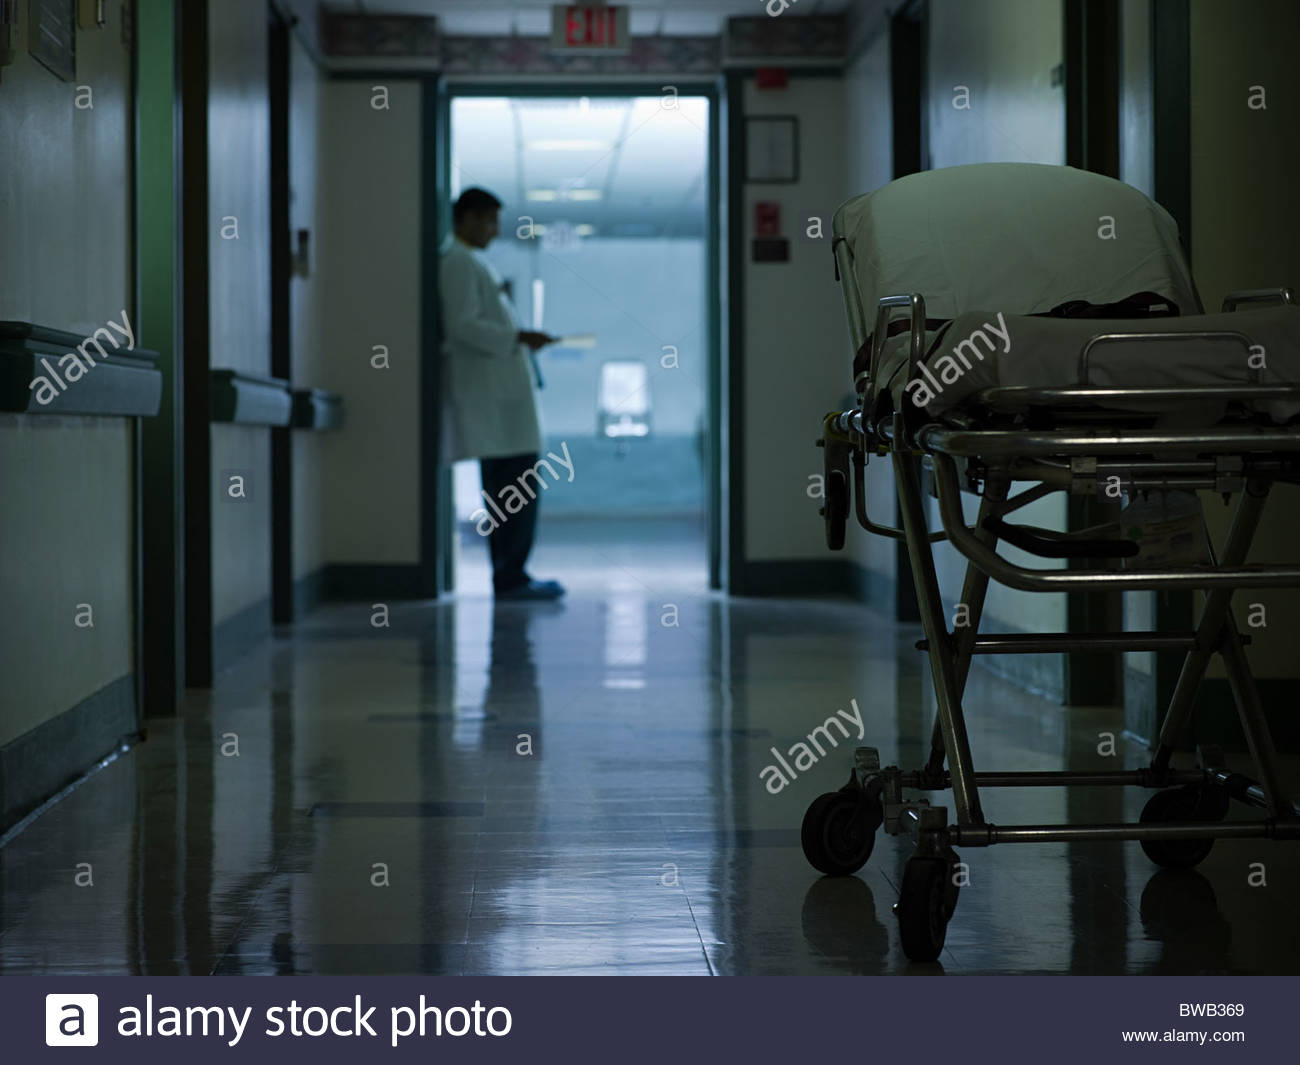 Male doctor in hospital corridor Photo Stock